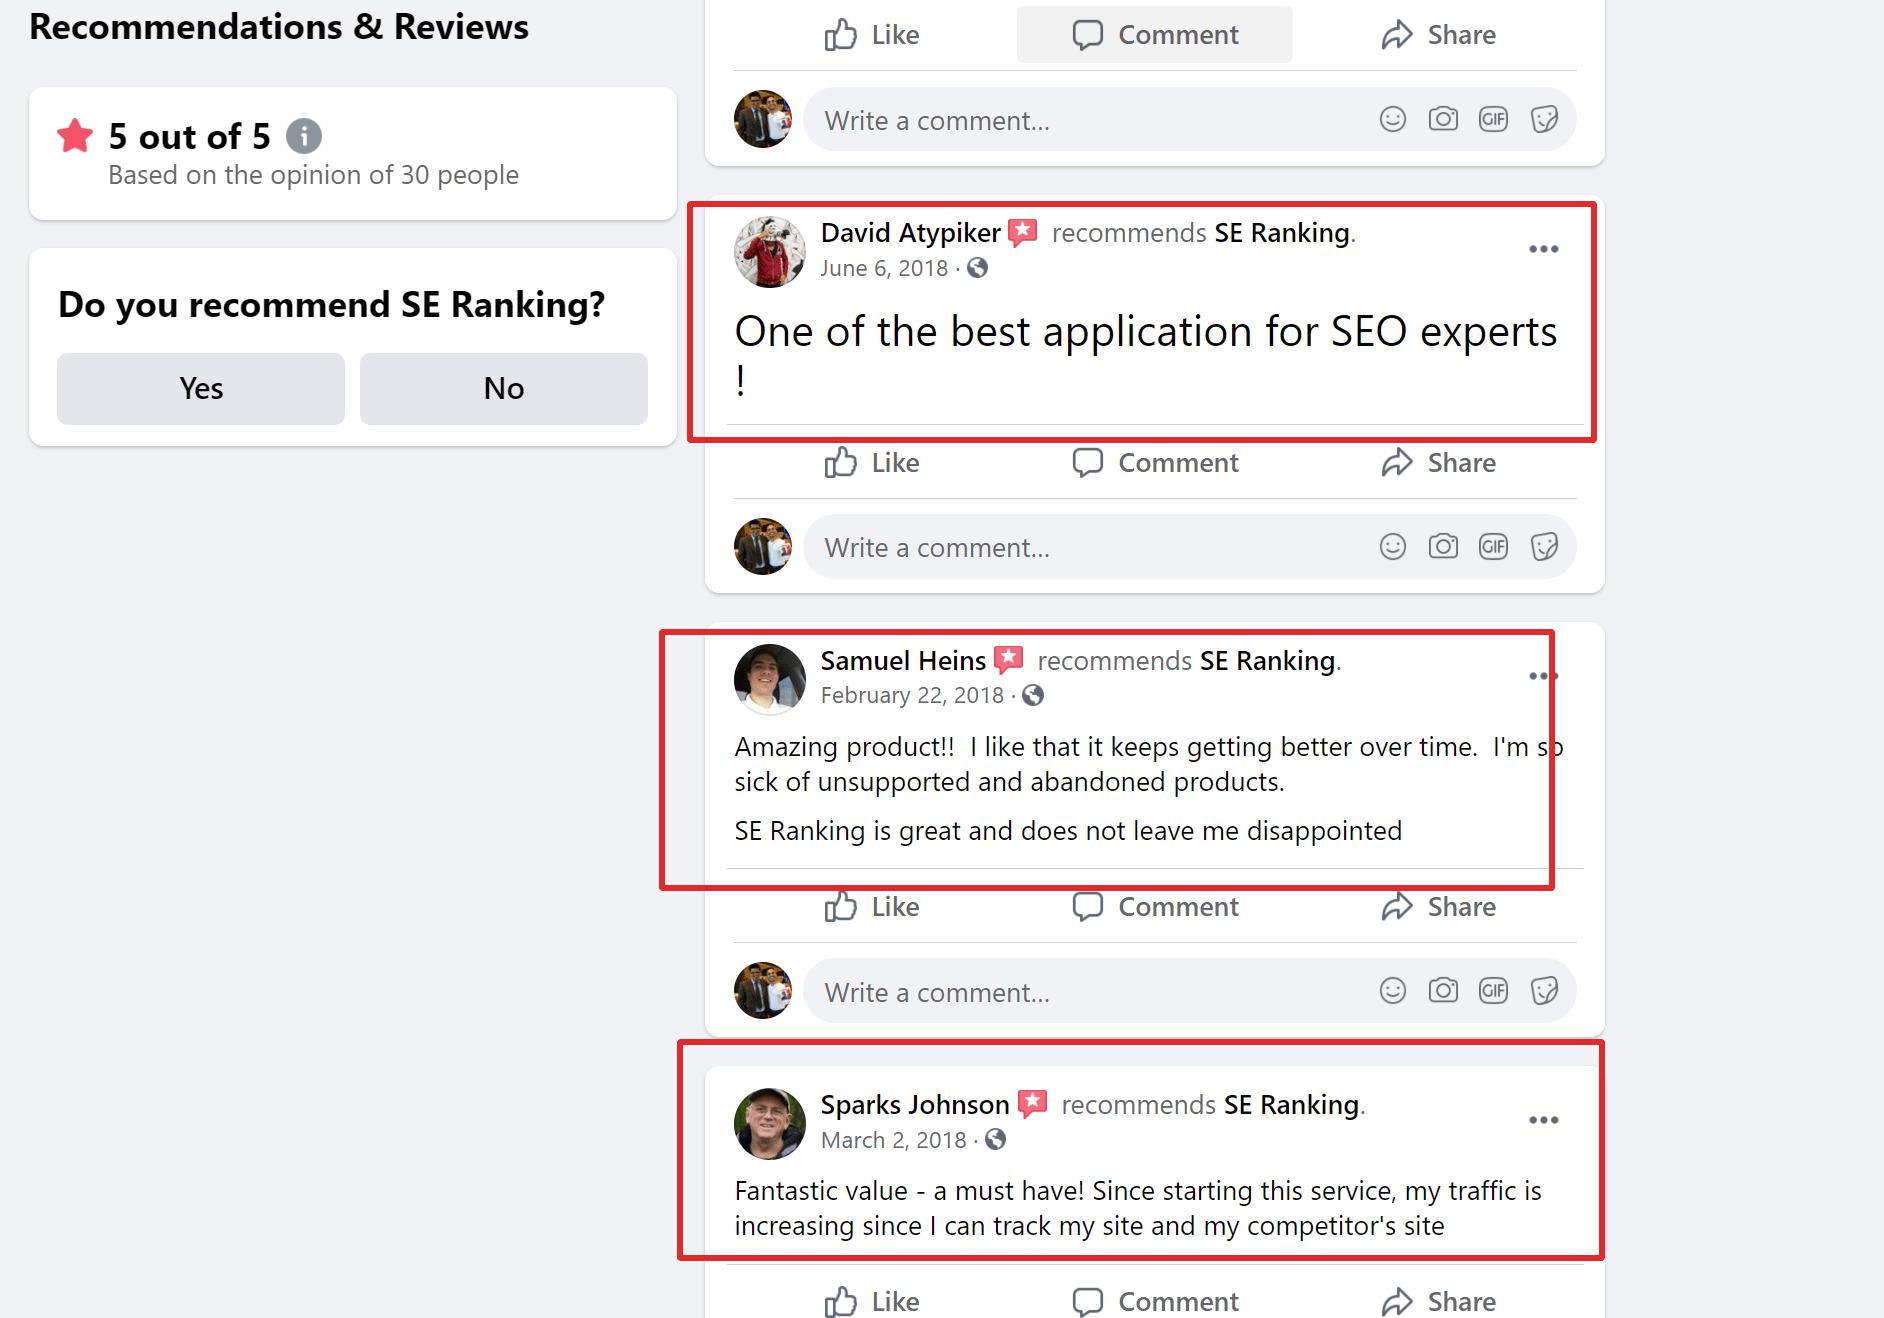 SE ranking customer feedback reviews